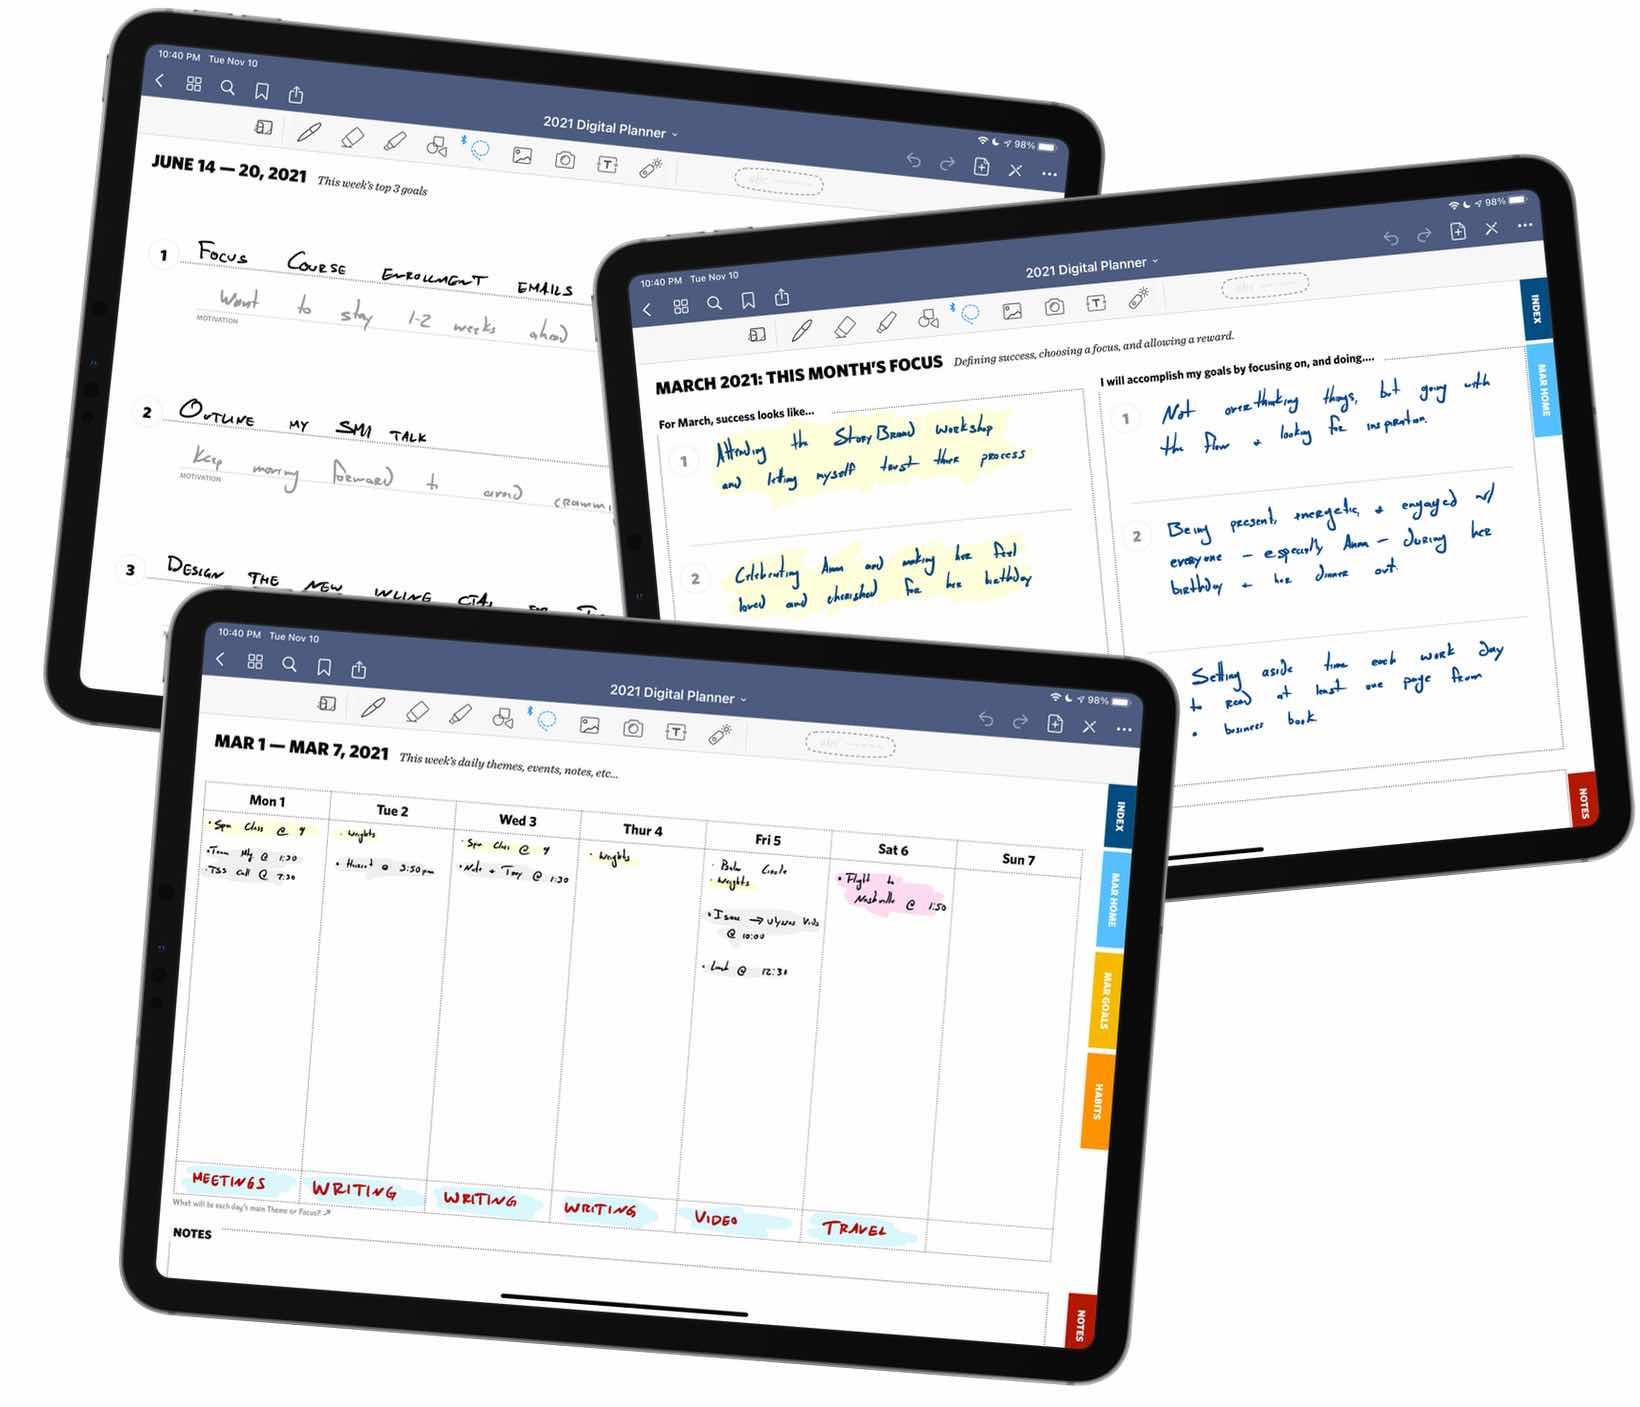 the-focus-course-2021-digital-planner-4